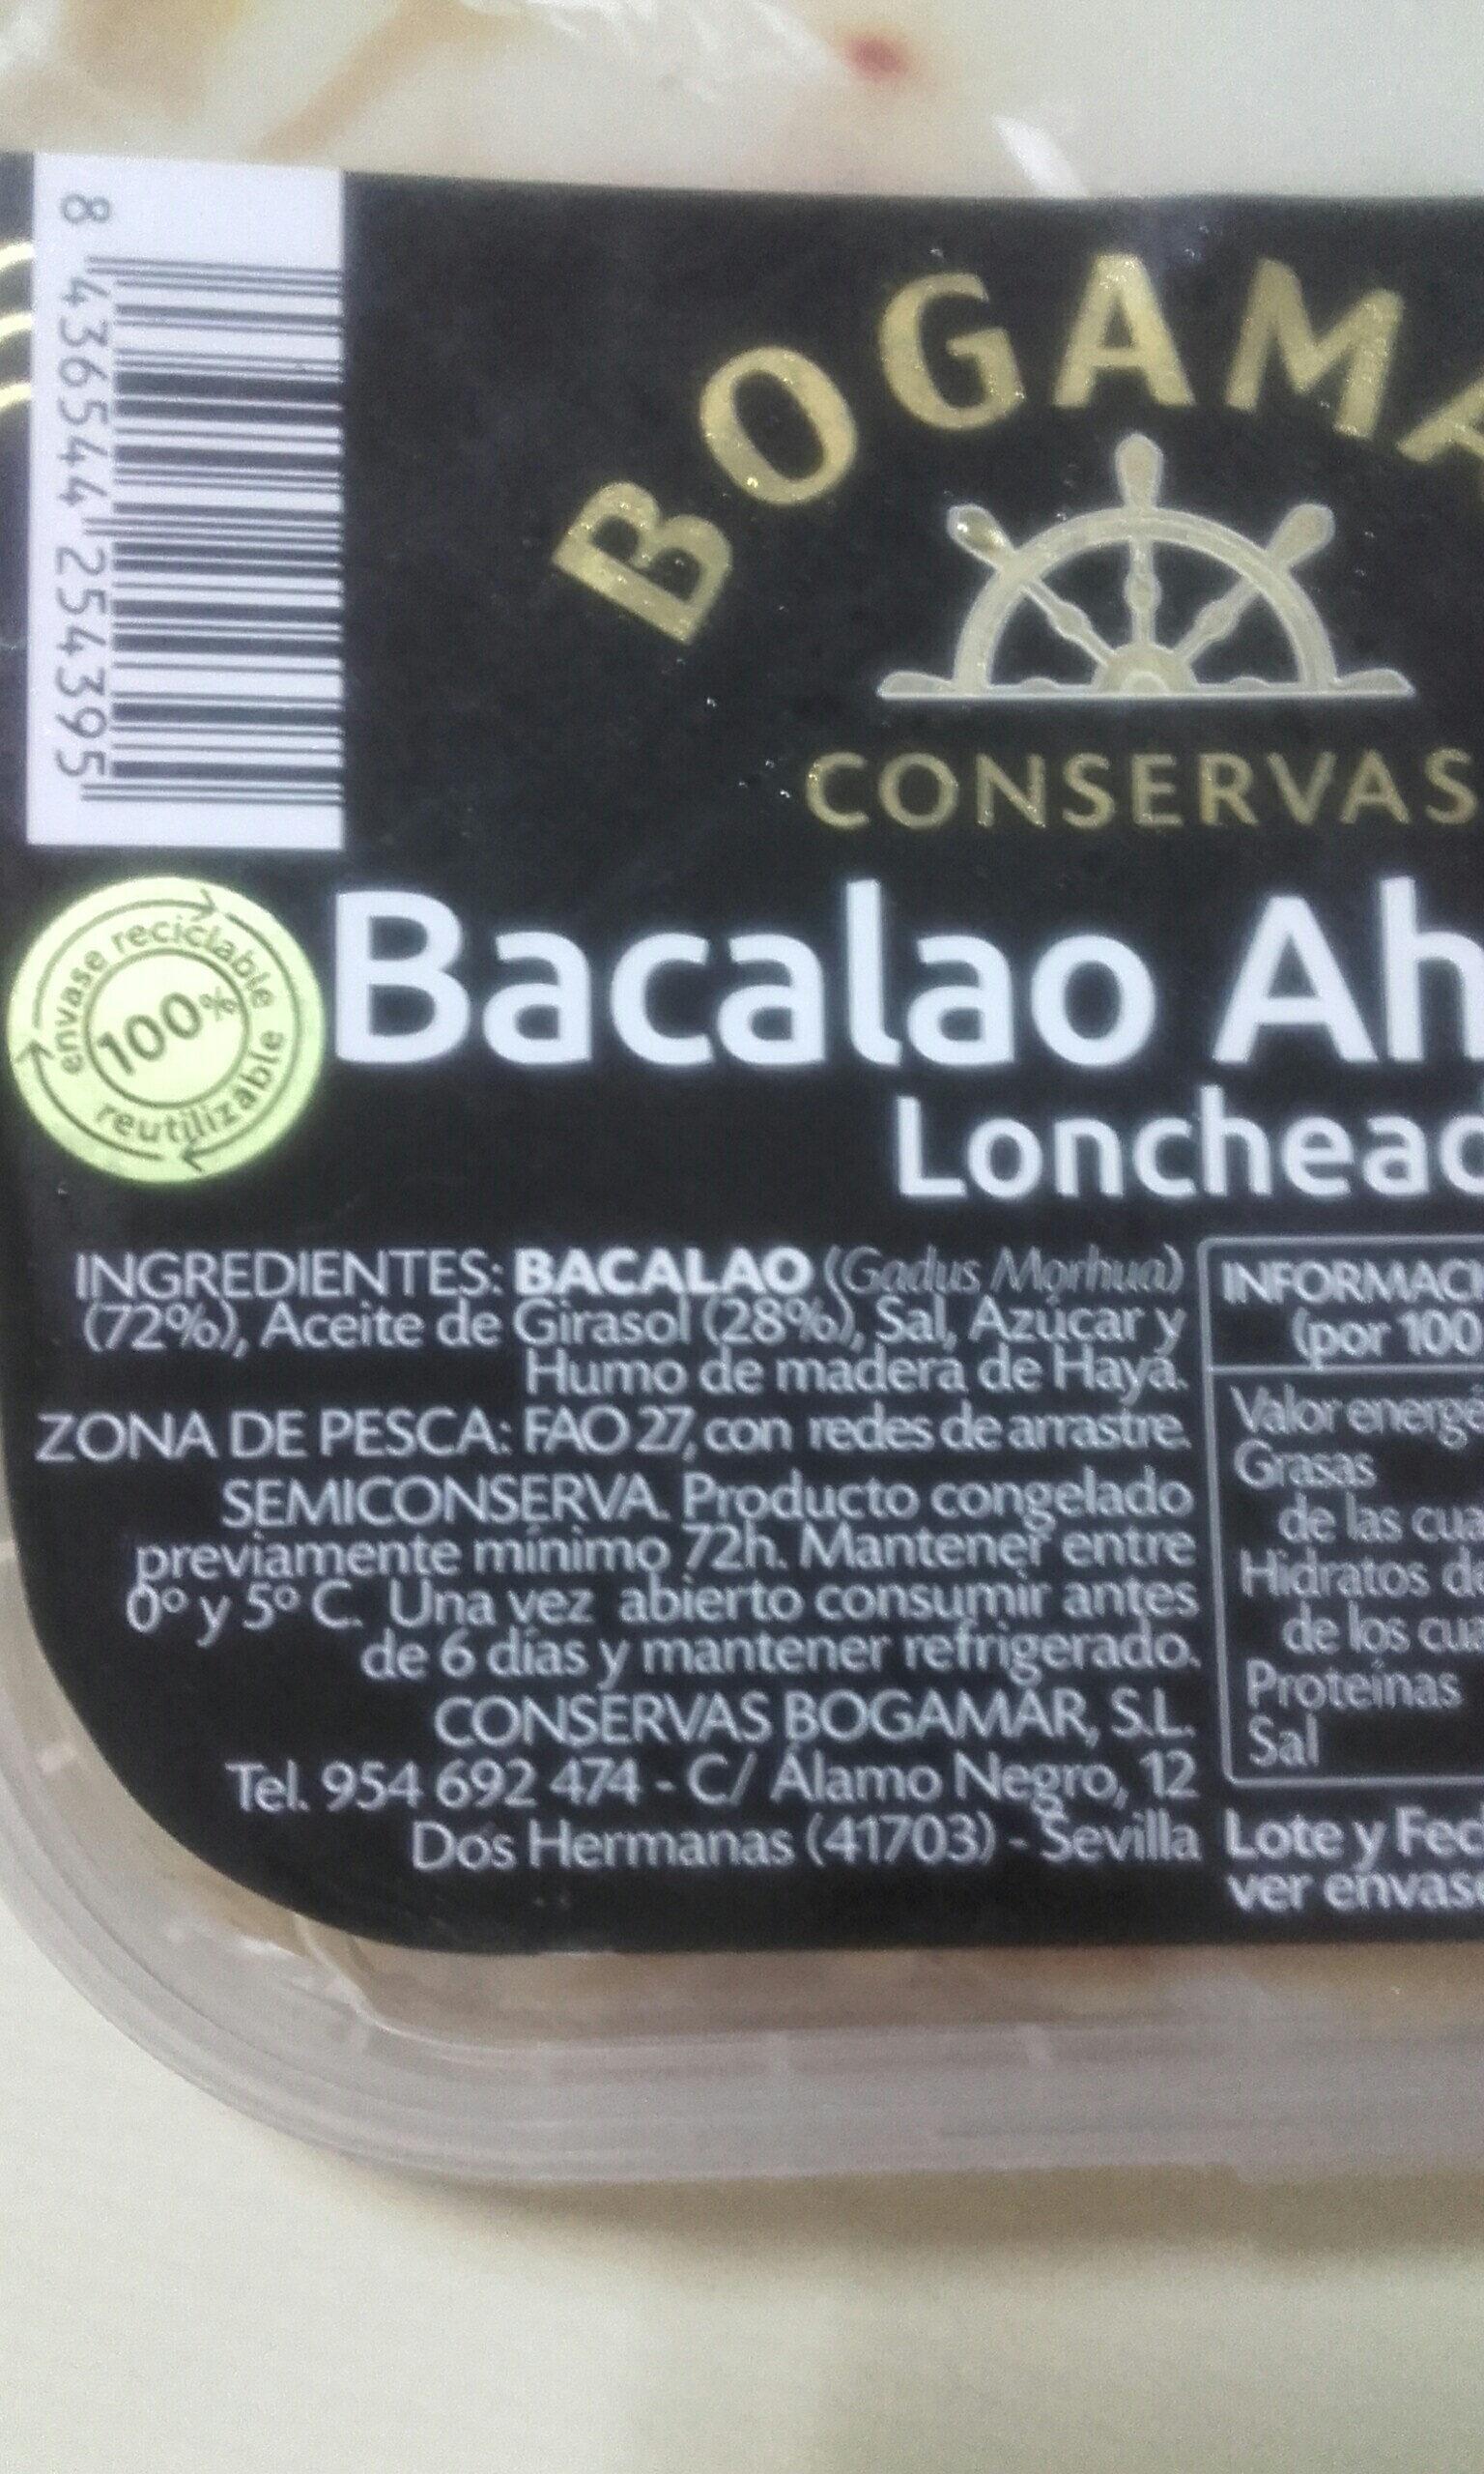 bacalao ahumado - Ingrédients